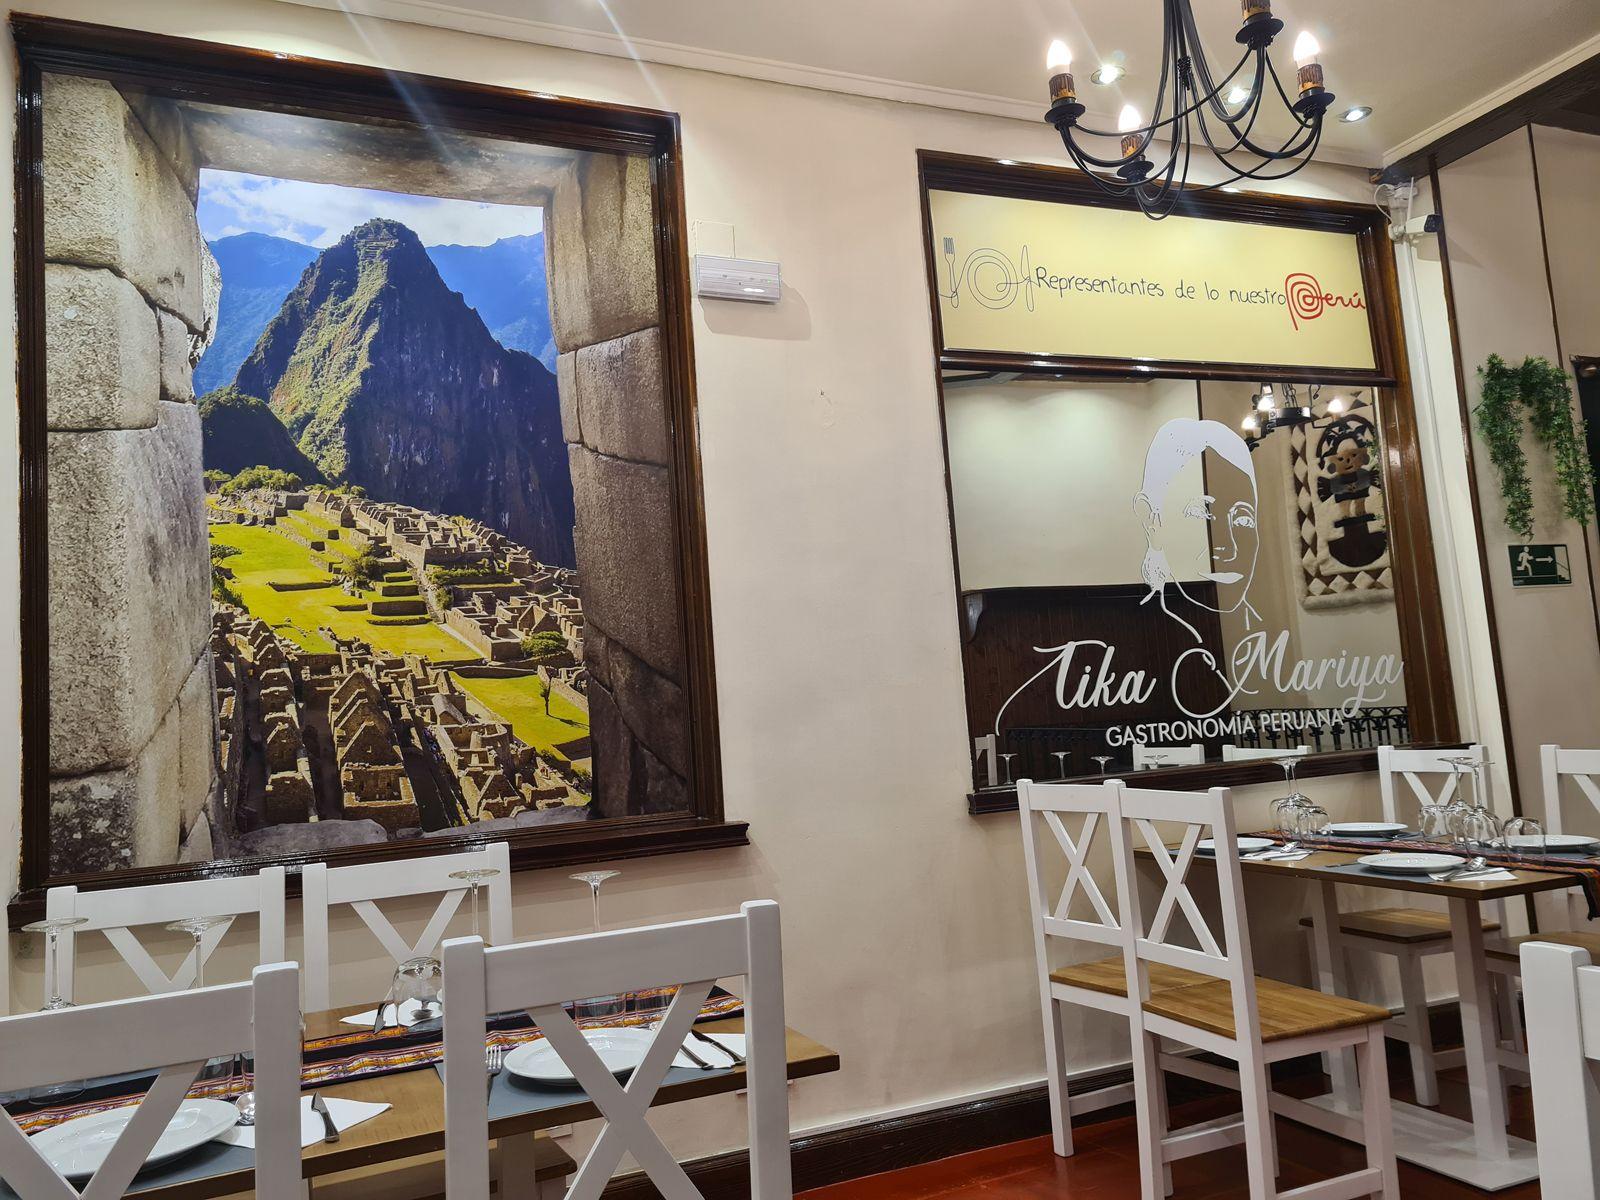 Foto 96 de Cocina peruana en    TIKA MARIYA